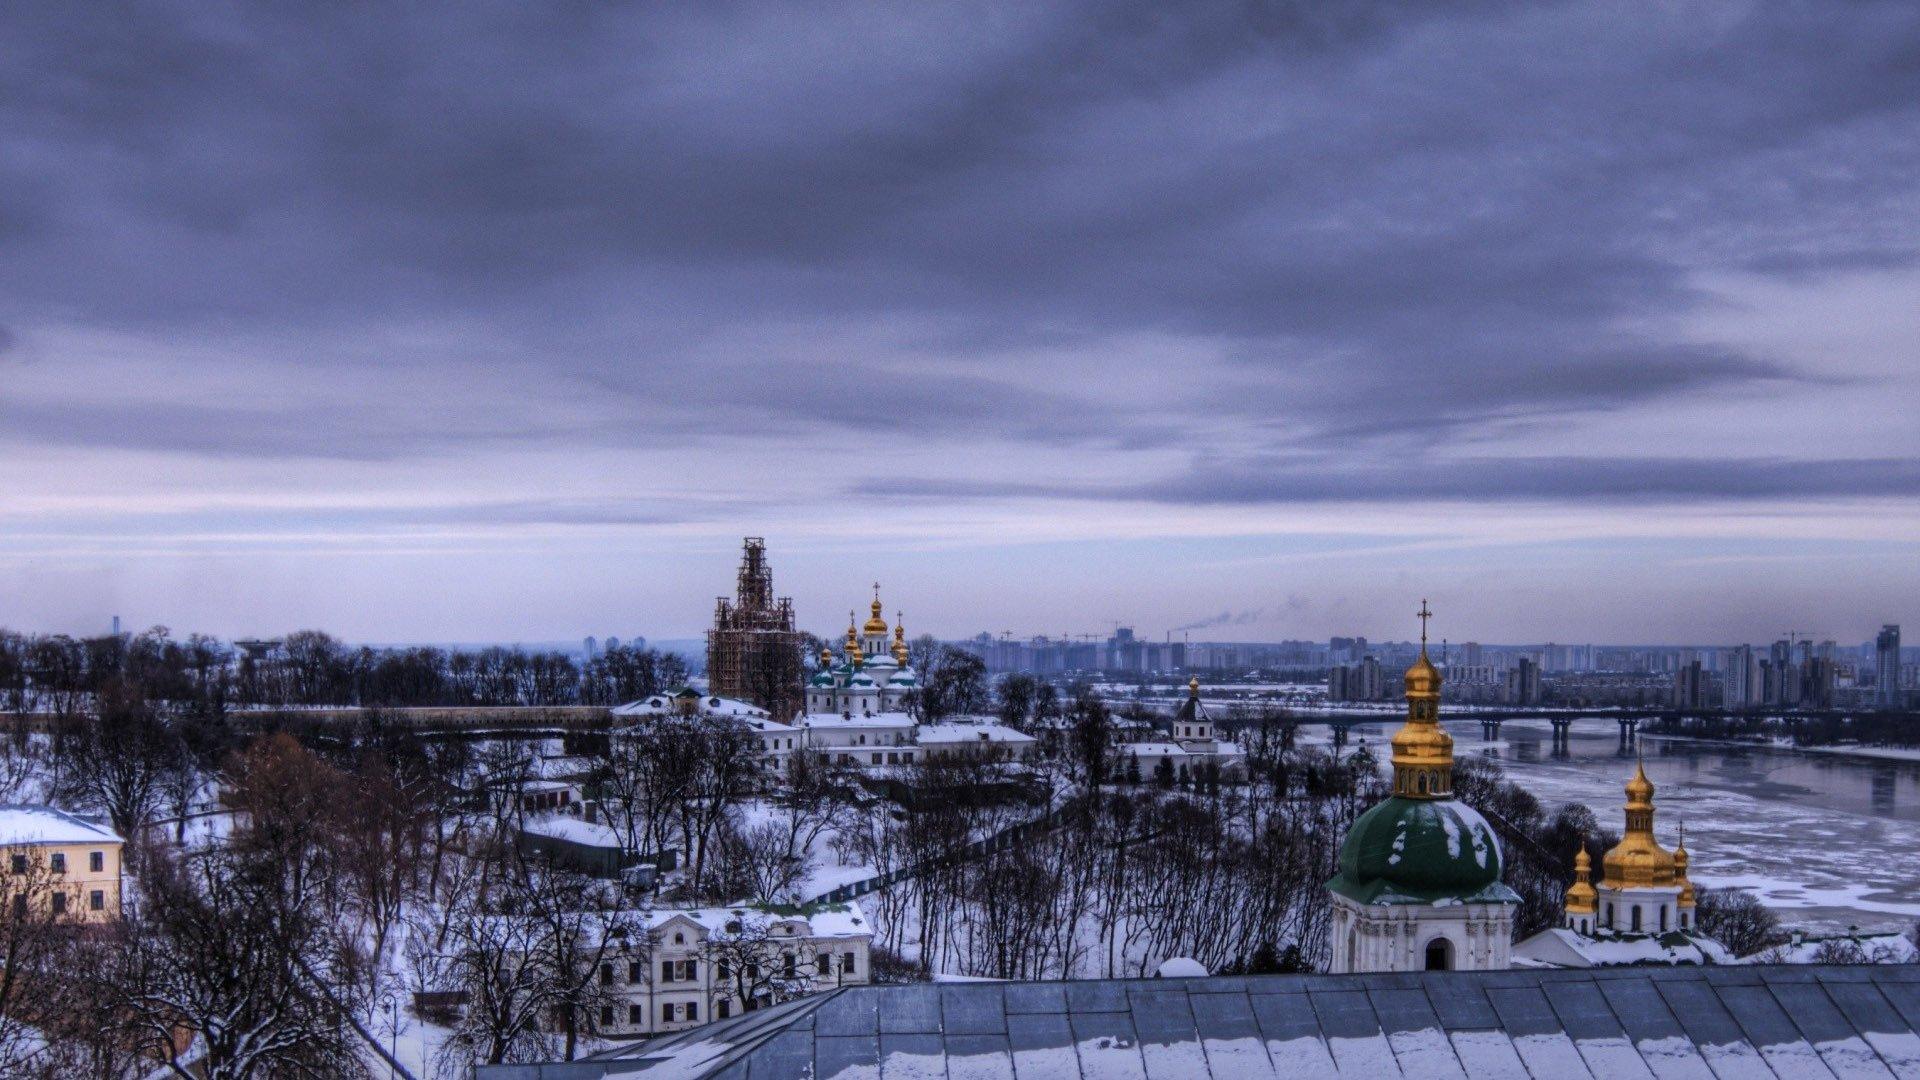 City In The Winter Hd Wallpaper